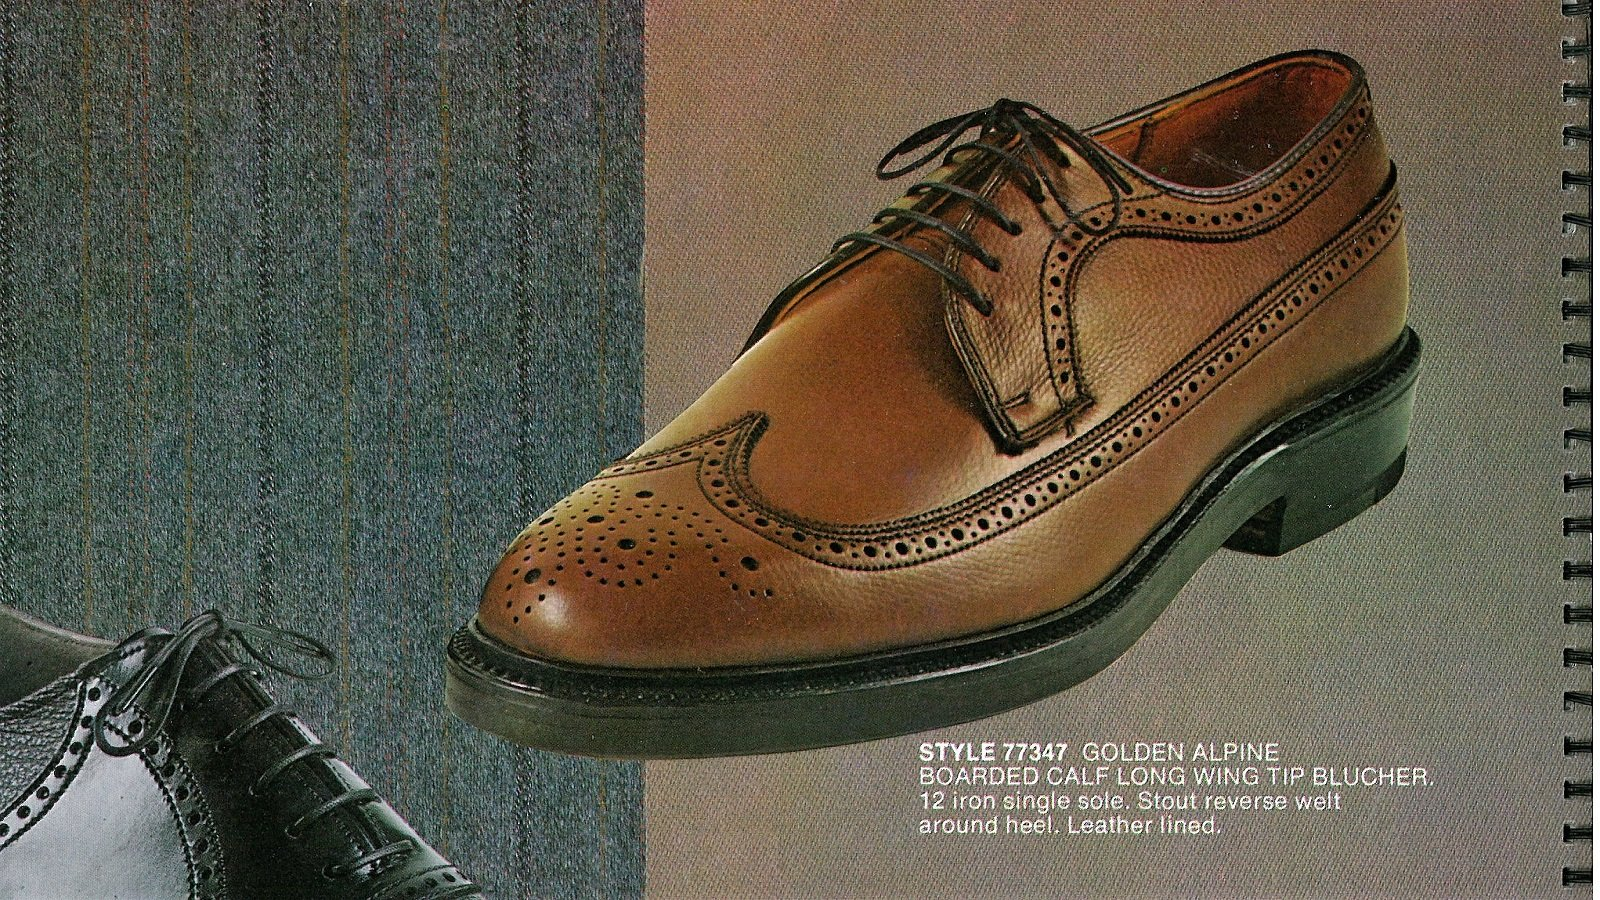 1970 FootJoy catalog